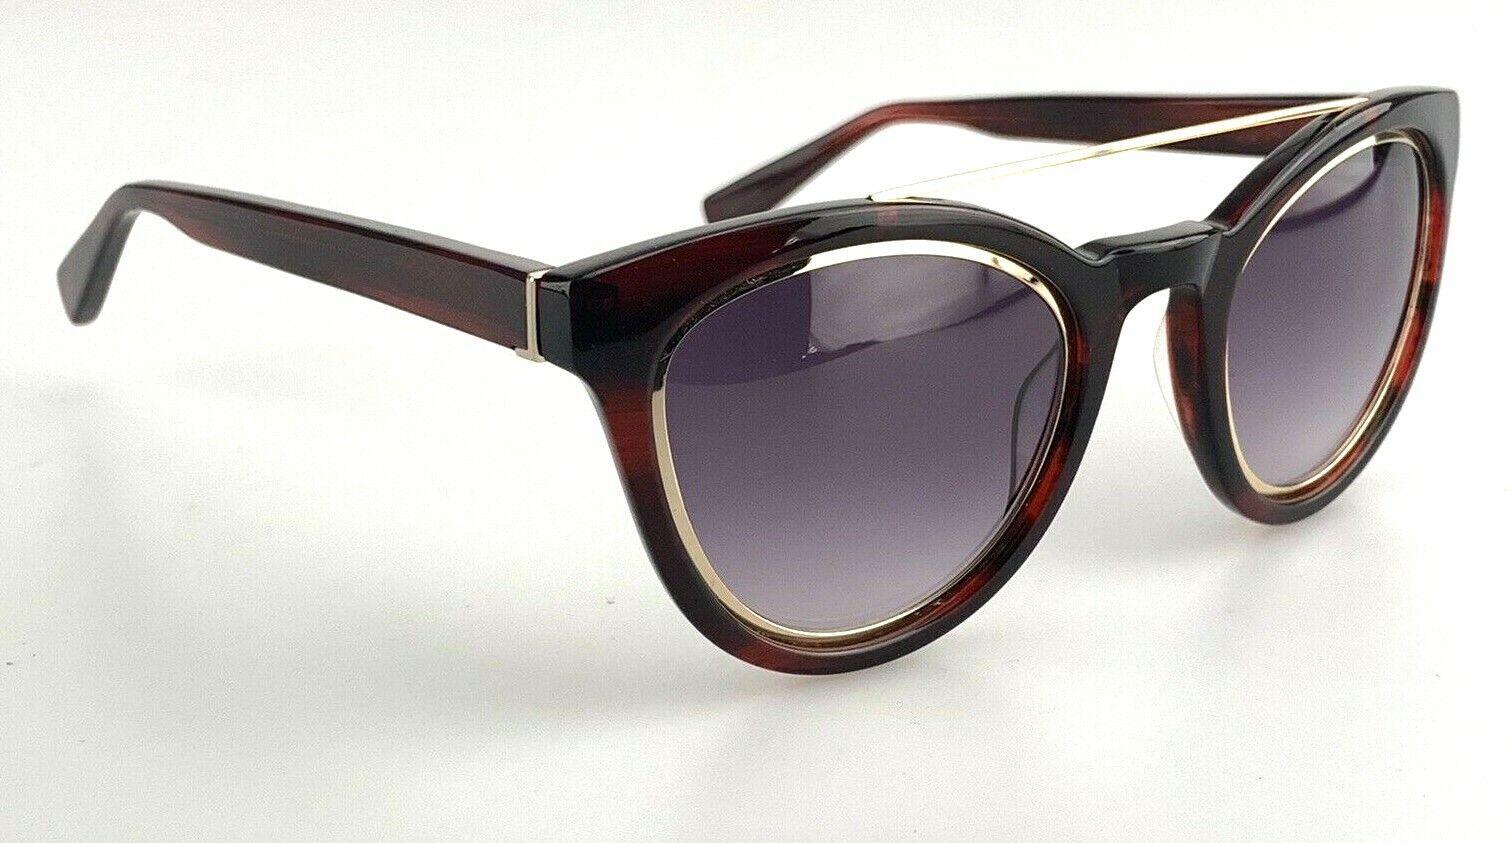 Derek Lam Sunglasses mod. Tessa Red Cat Eye Gold Brow Bar Mirrored Made in Japan